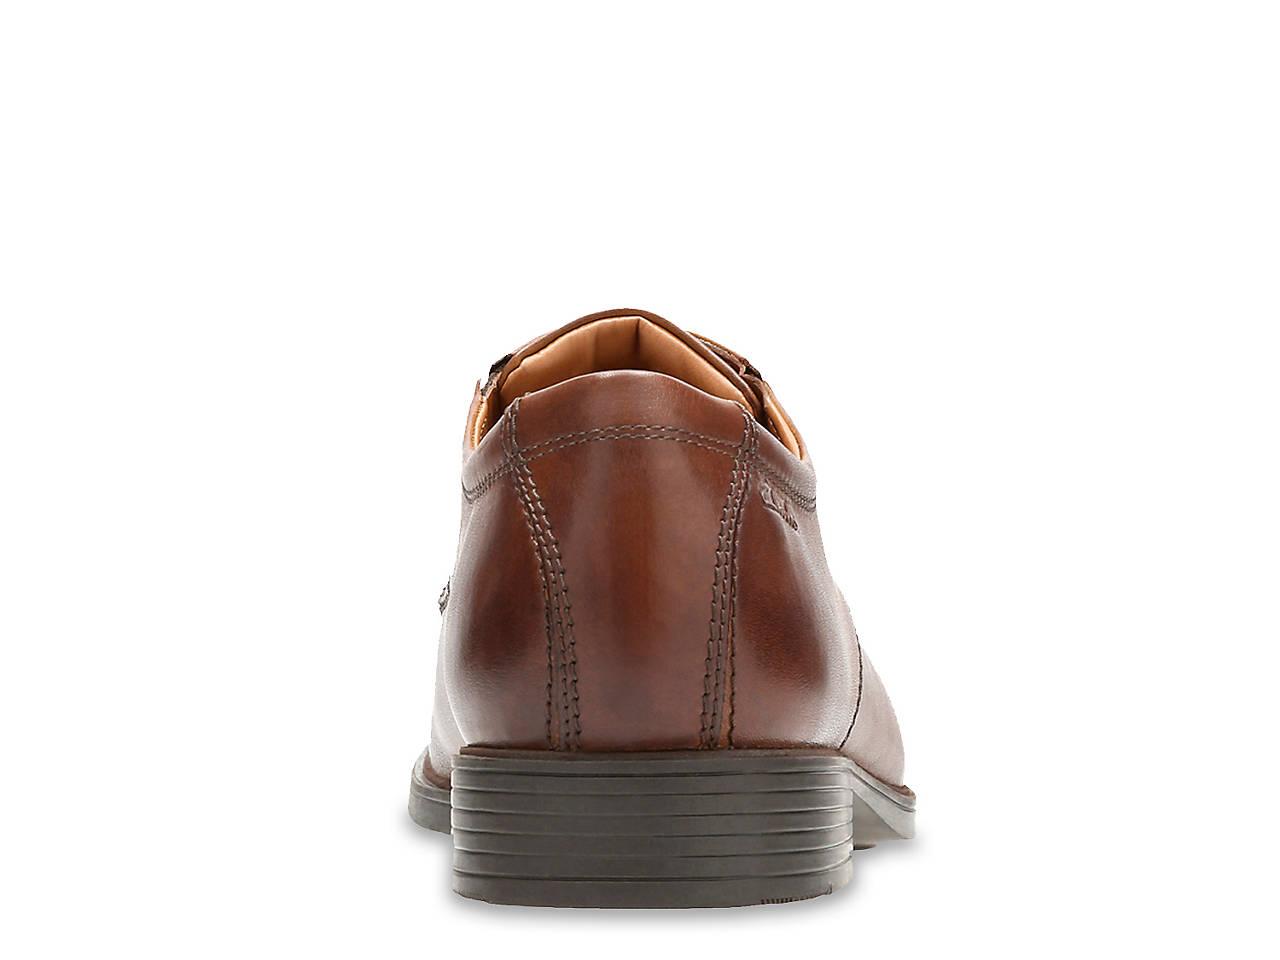 Clarks Tilden Walk Oxford Men's Shoes DSW  DSW